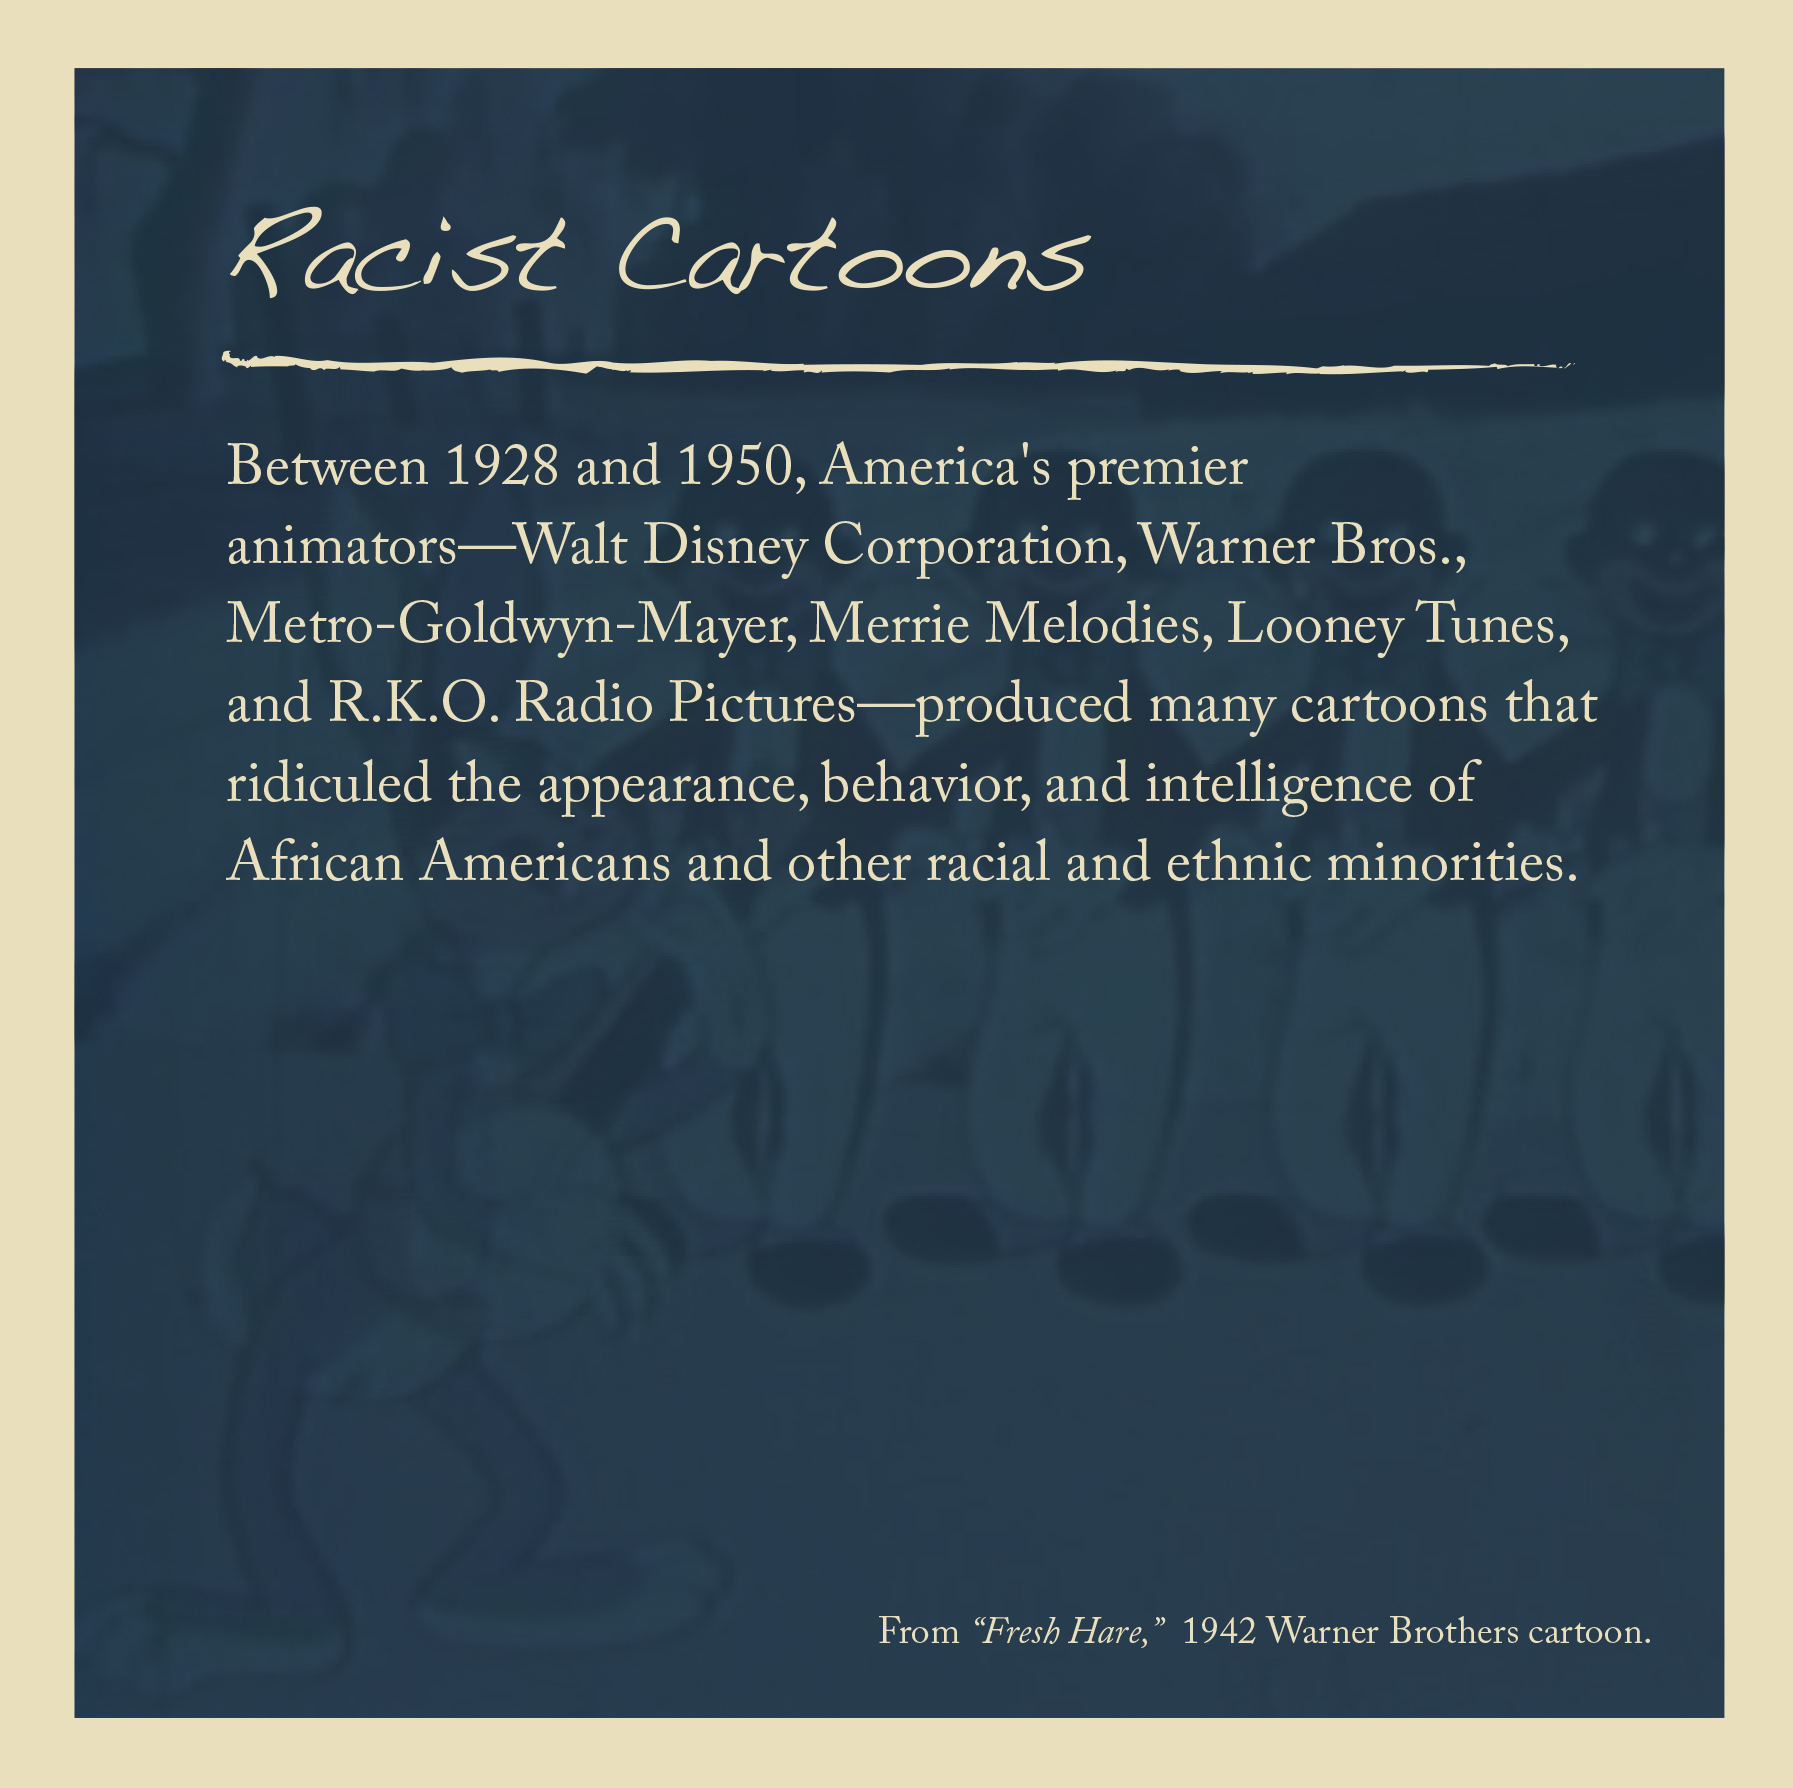 Racist Crtoons.jpg